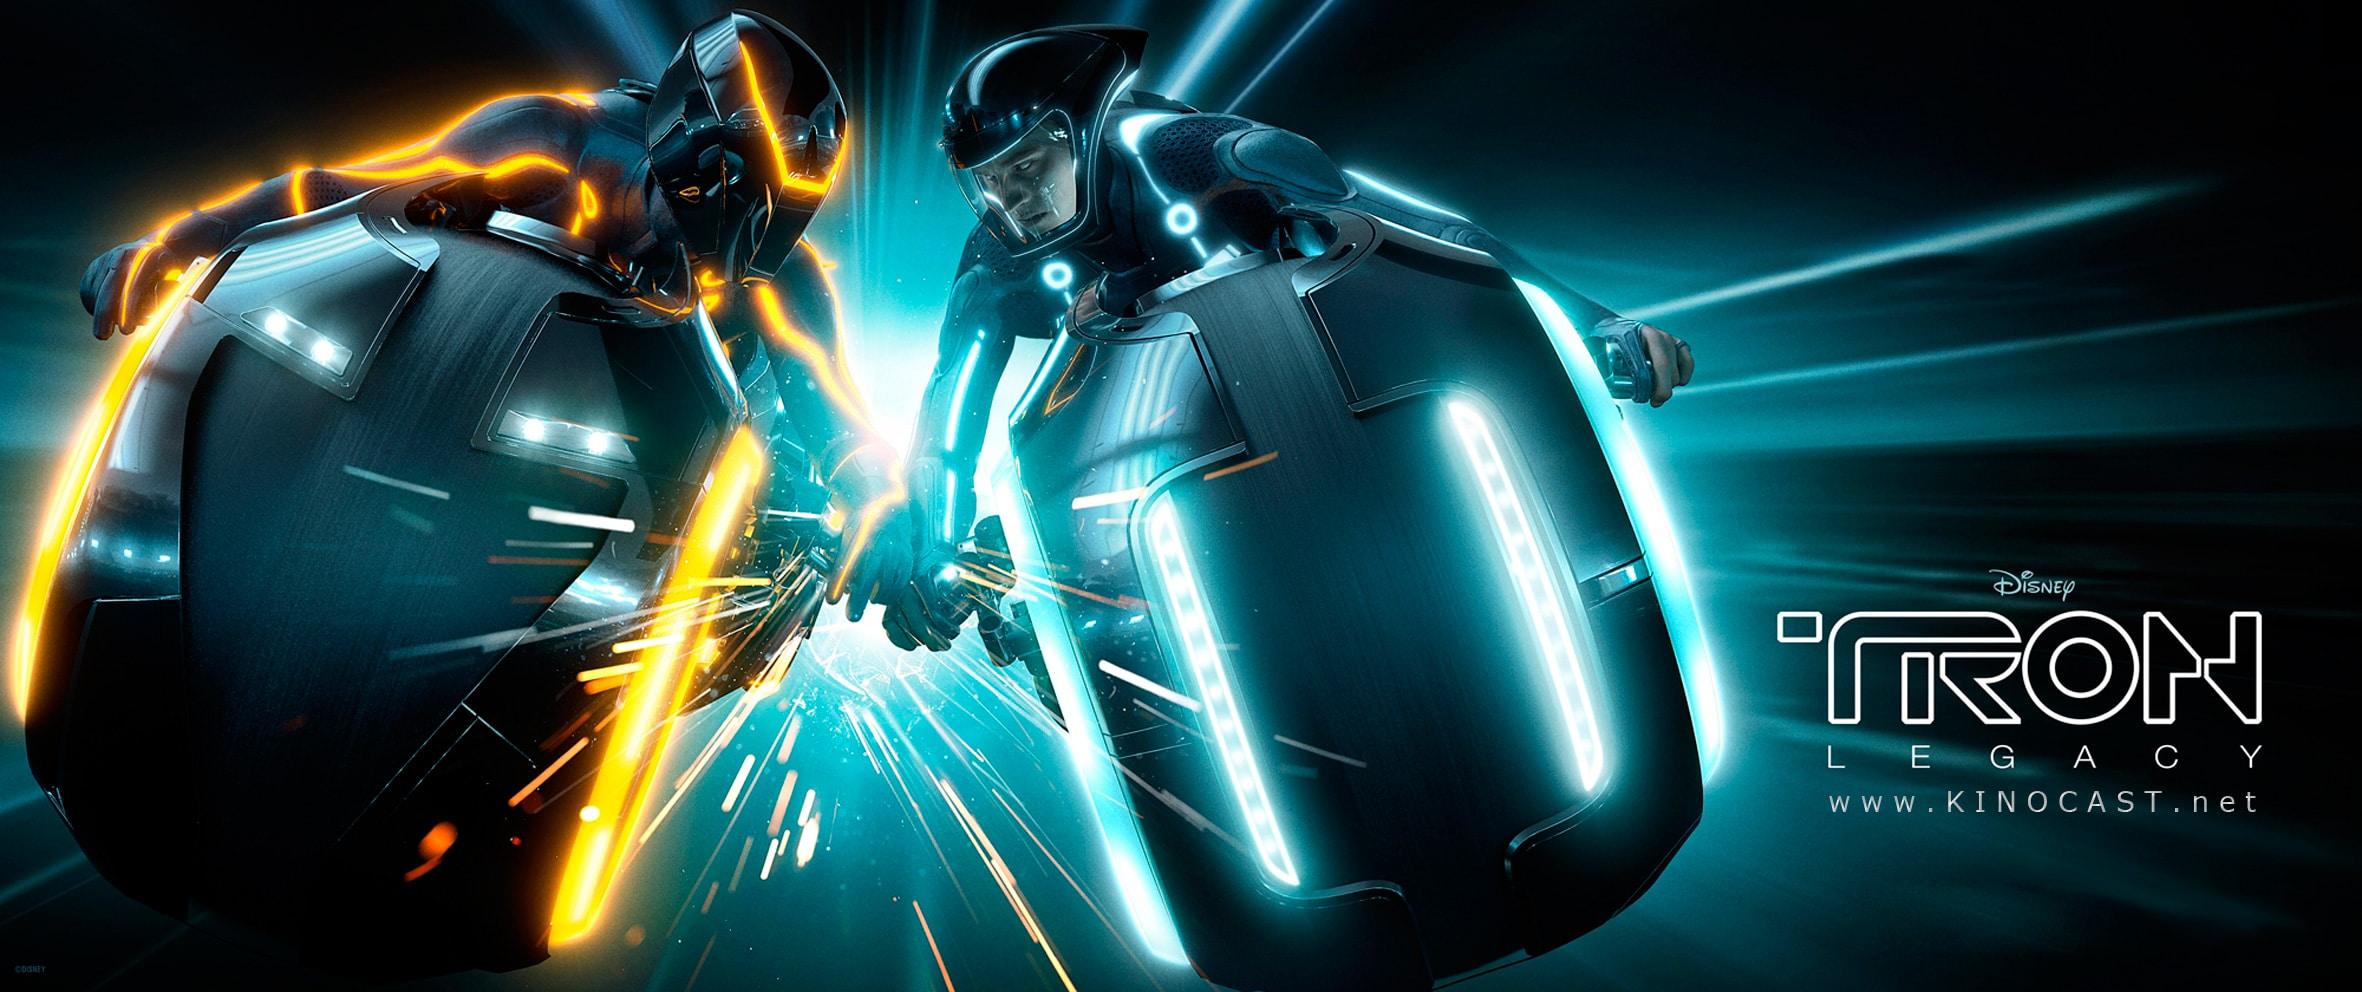 Tron-Legacy-Film-Poster